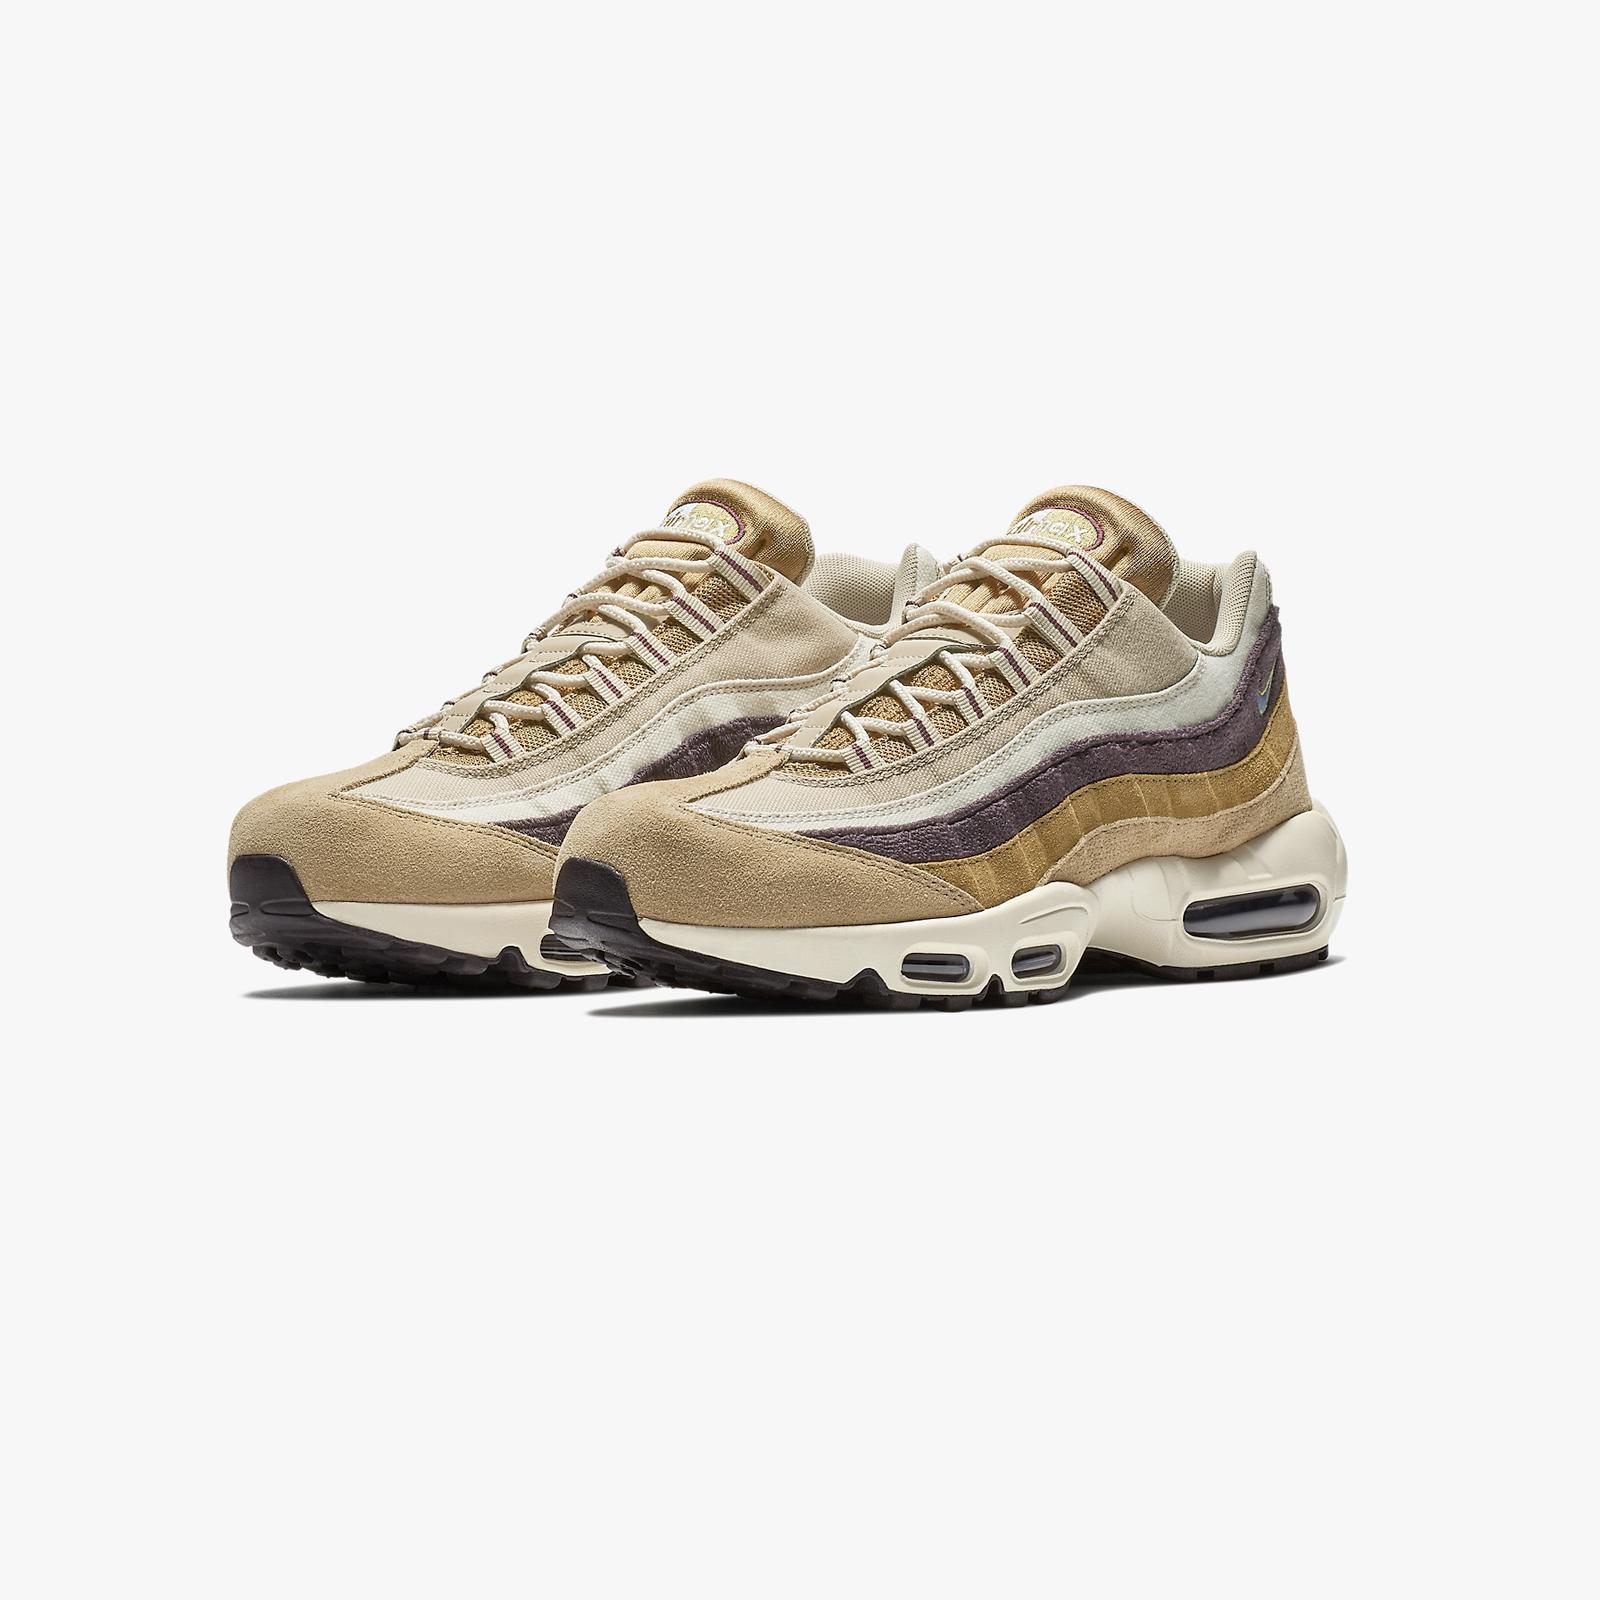 3a6ce78ddf Nike Air Max 95 Premium - 538416-205 - Sneakersnstuff | sneakers &  streetwear online since 1999